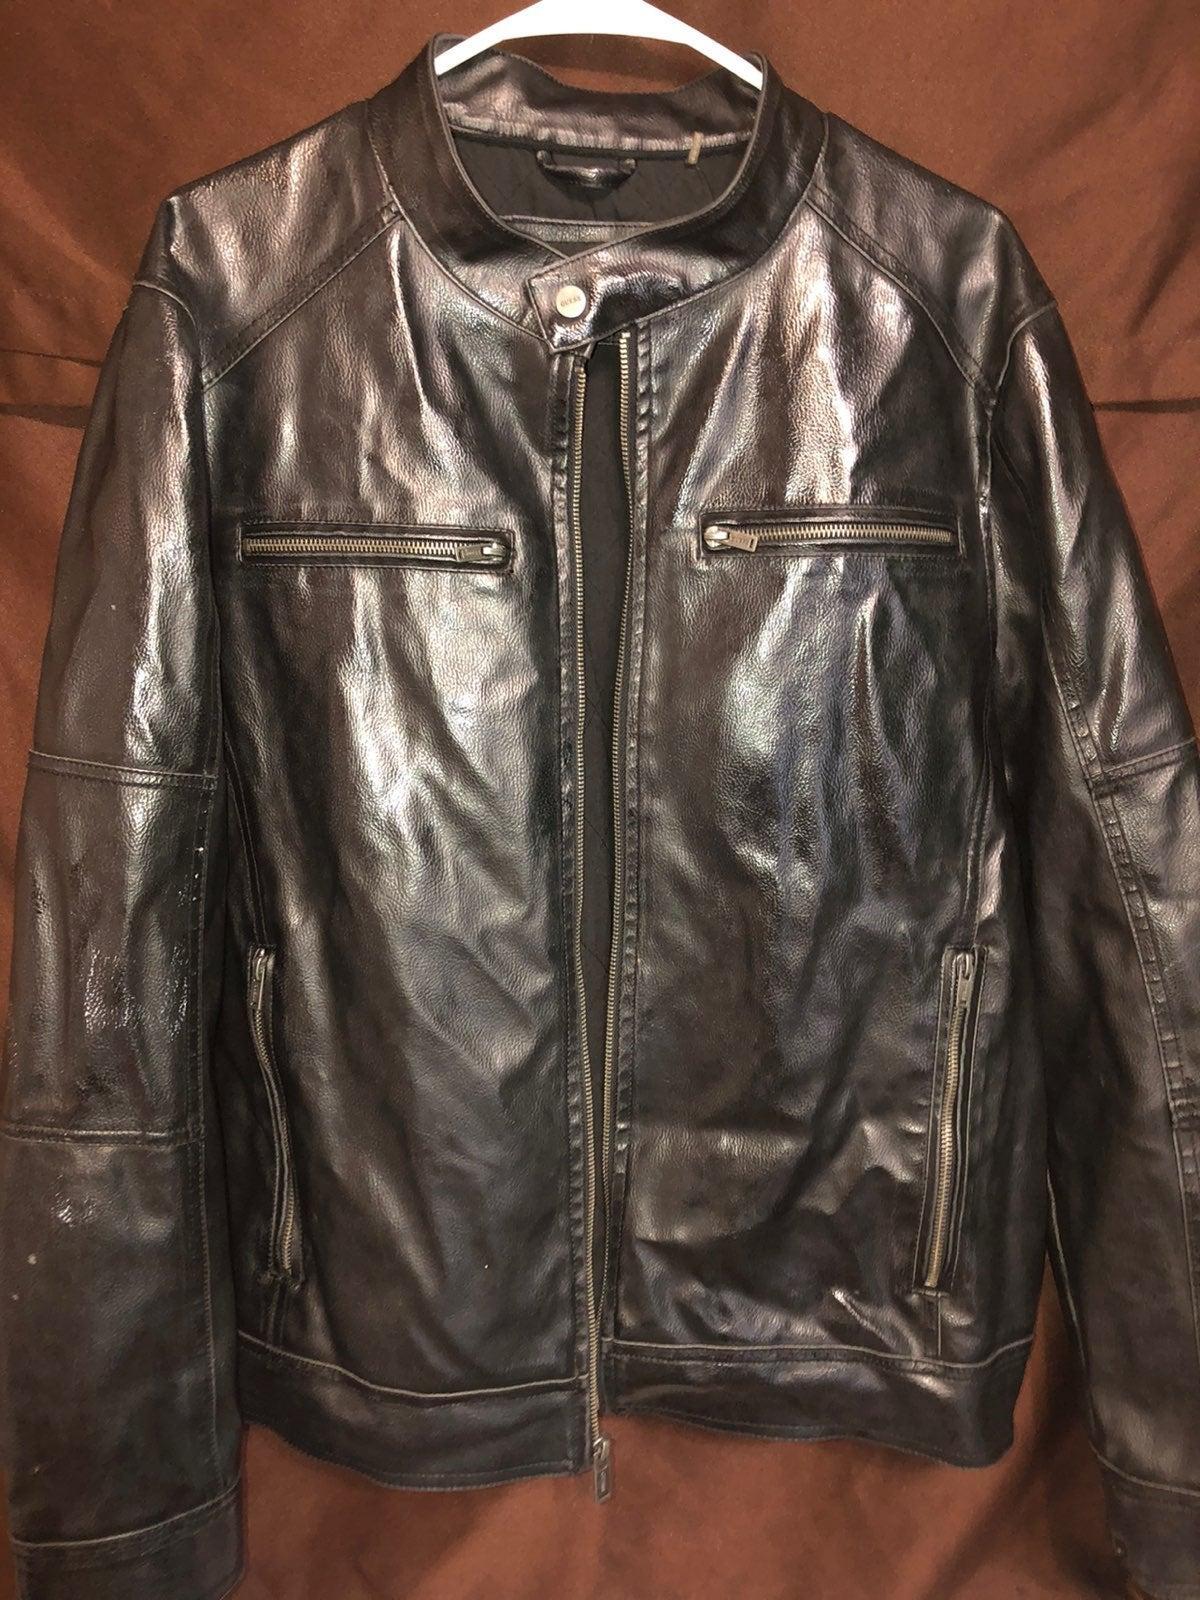 Guess Leather Vintage Jacket Unisex